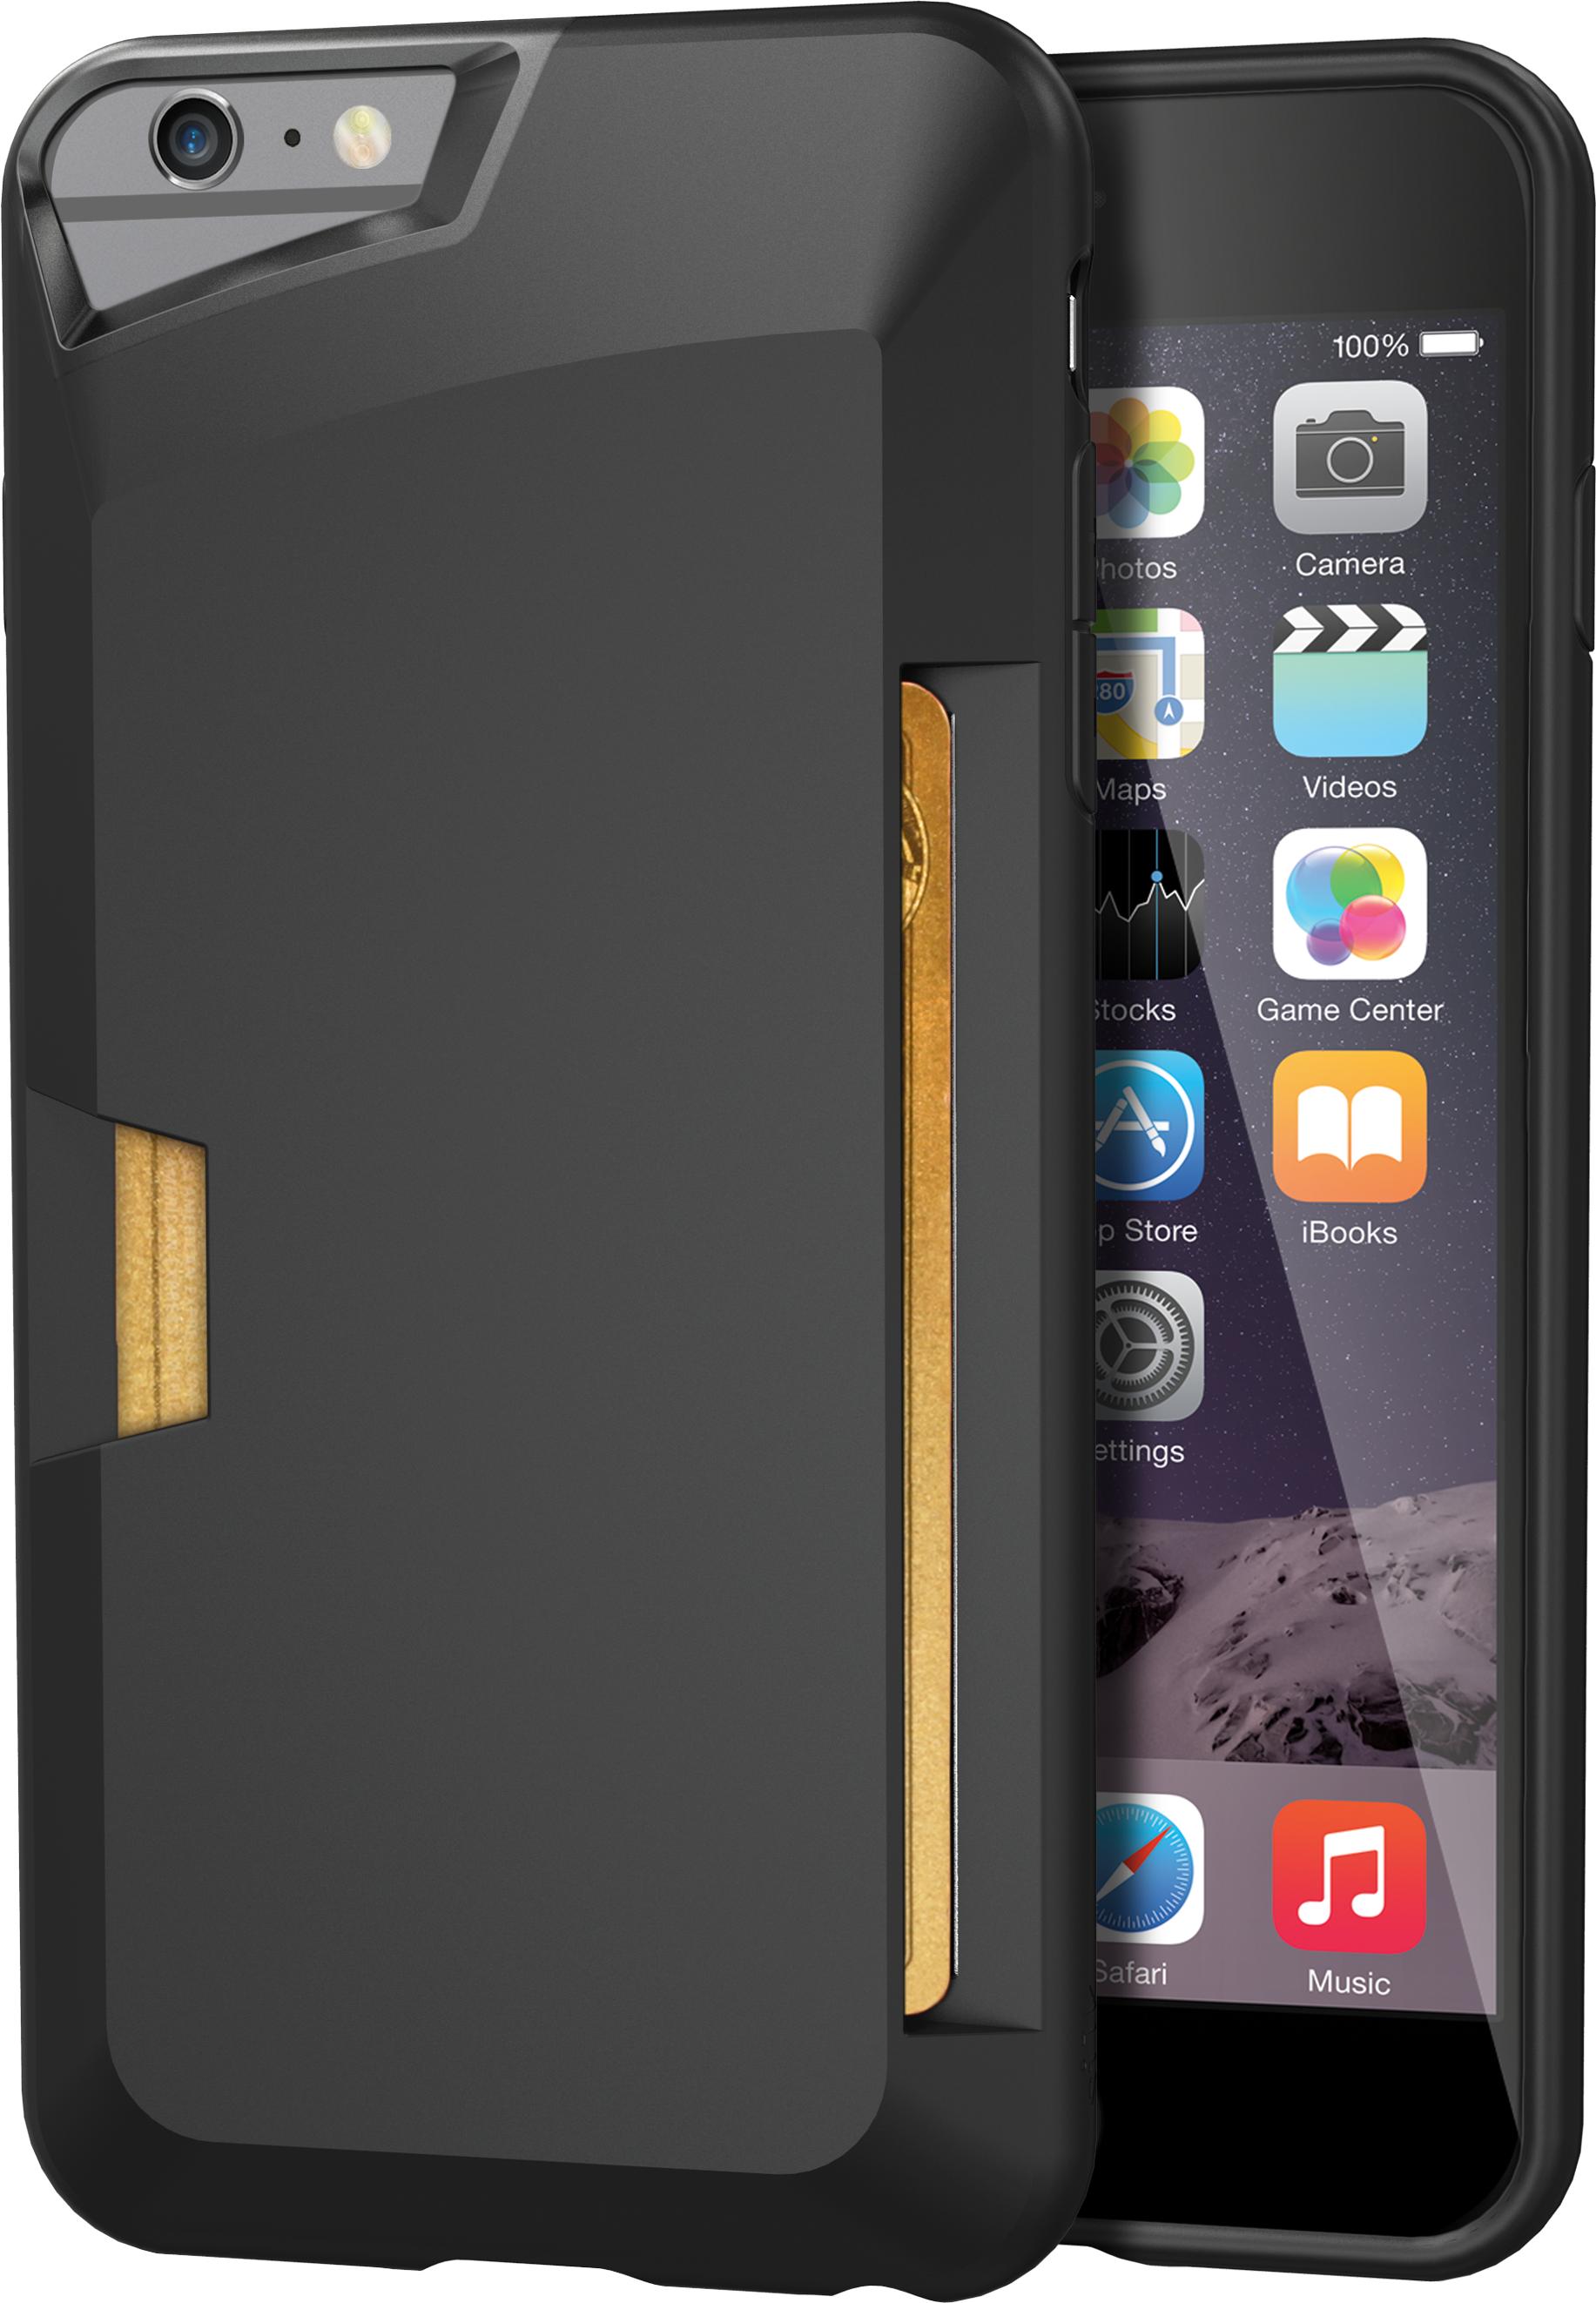 Iphone 6s wallet case amazon